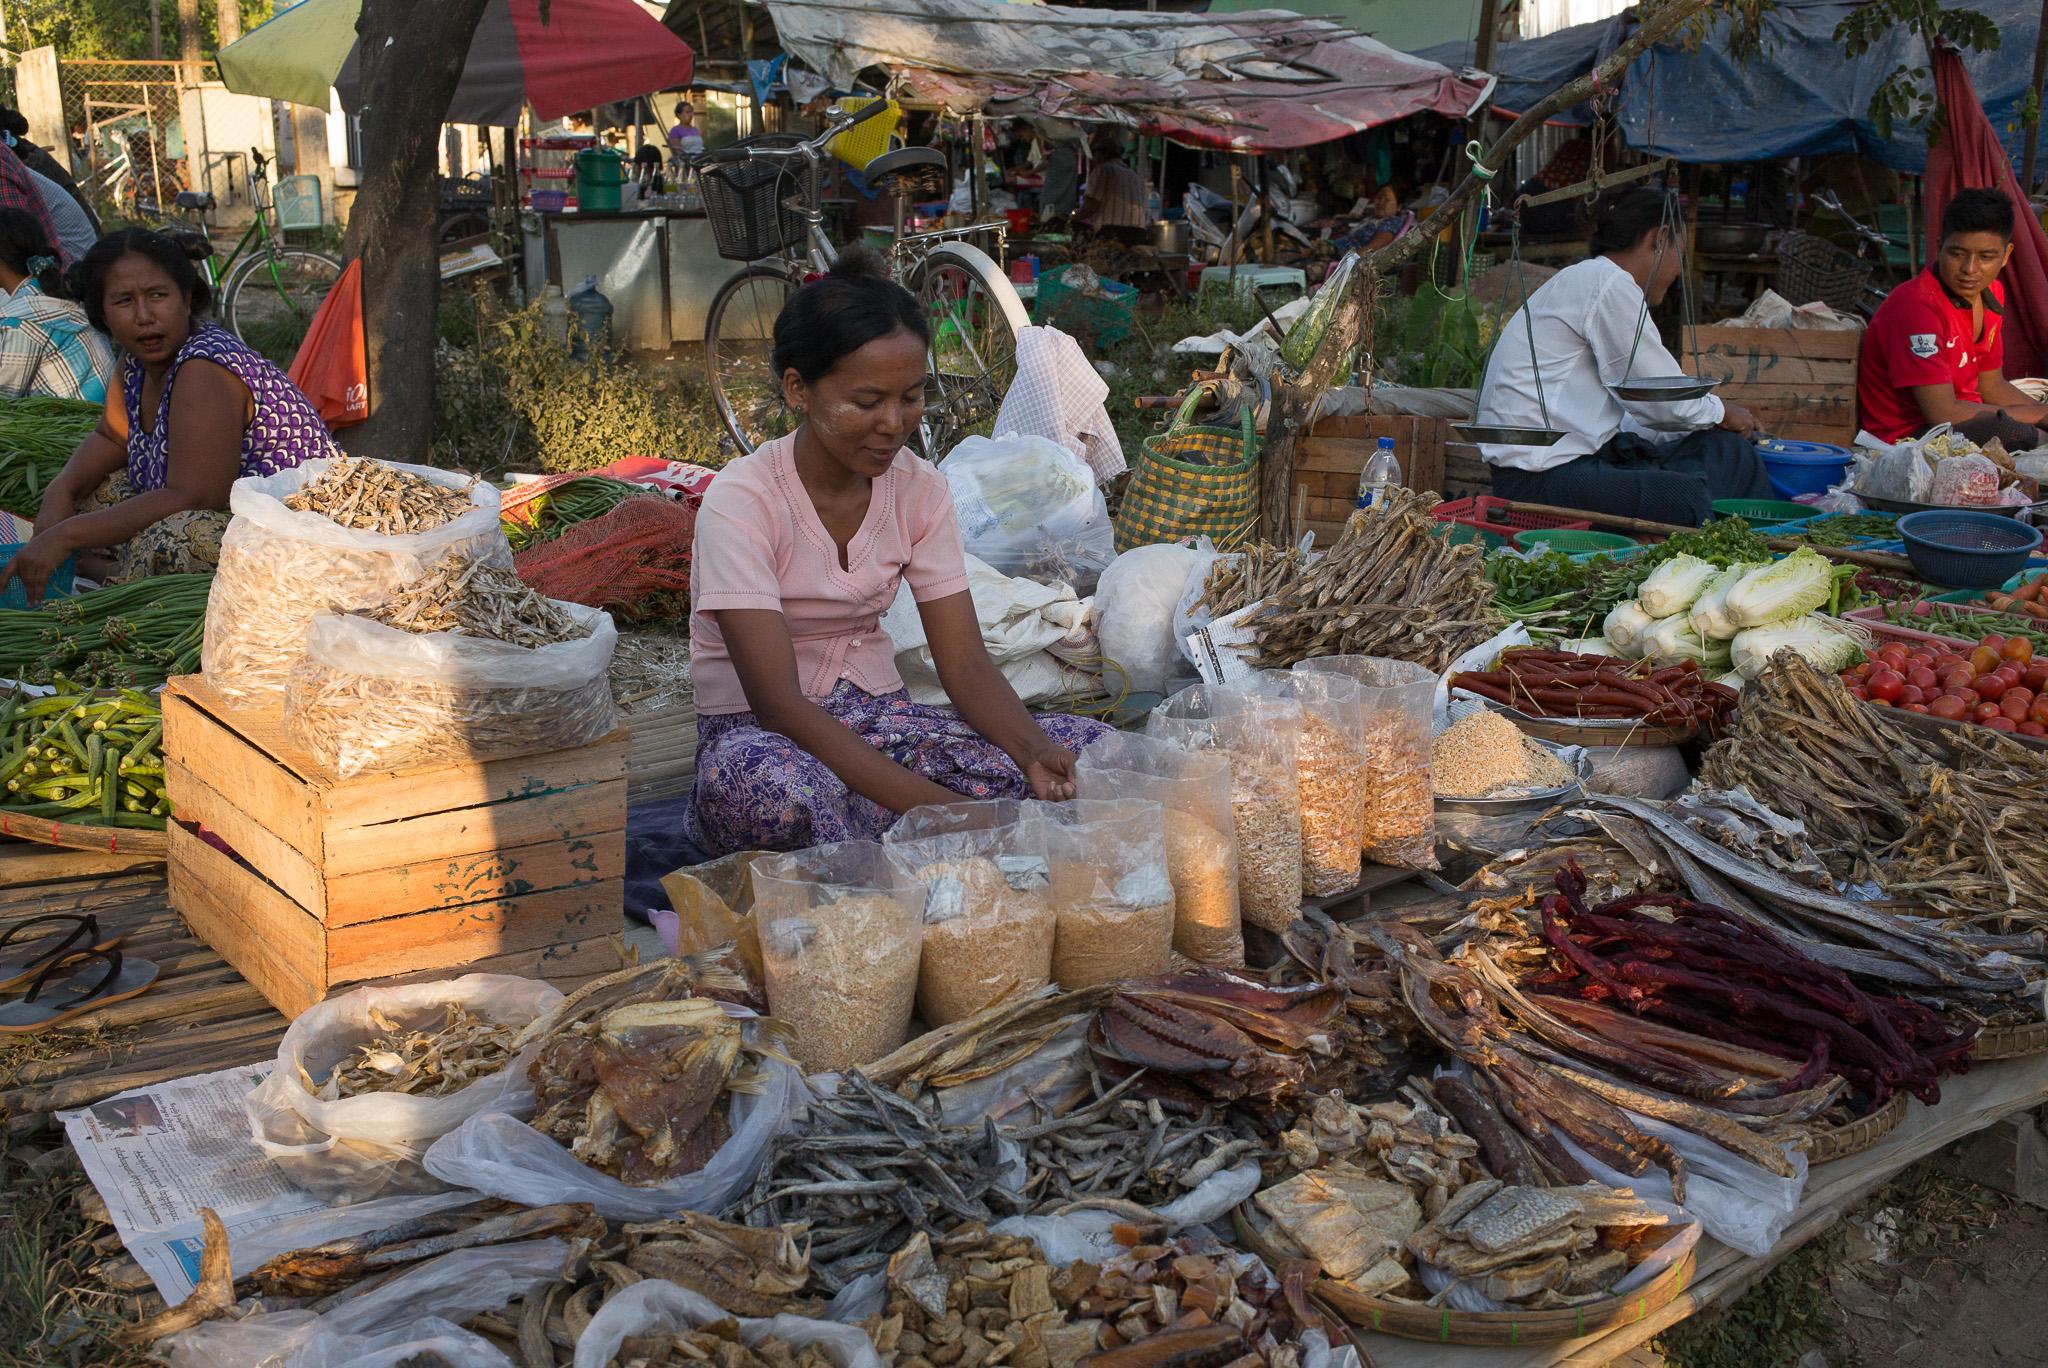 13-Burma-0294-P-1412.jpg